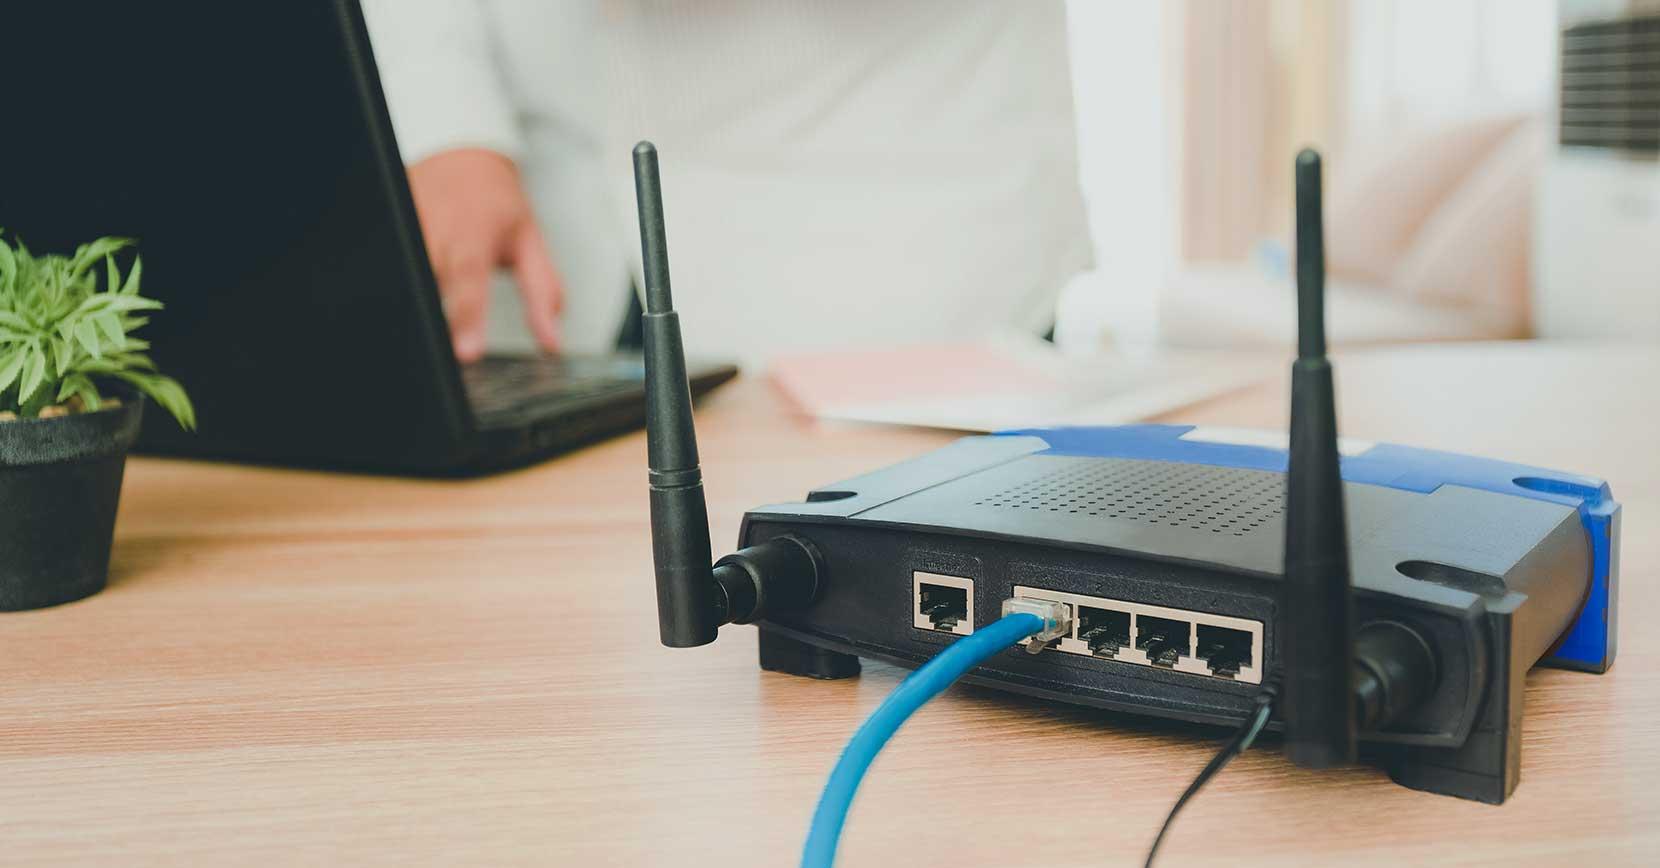 Melhorar sinal wi fi